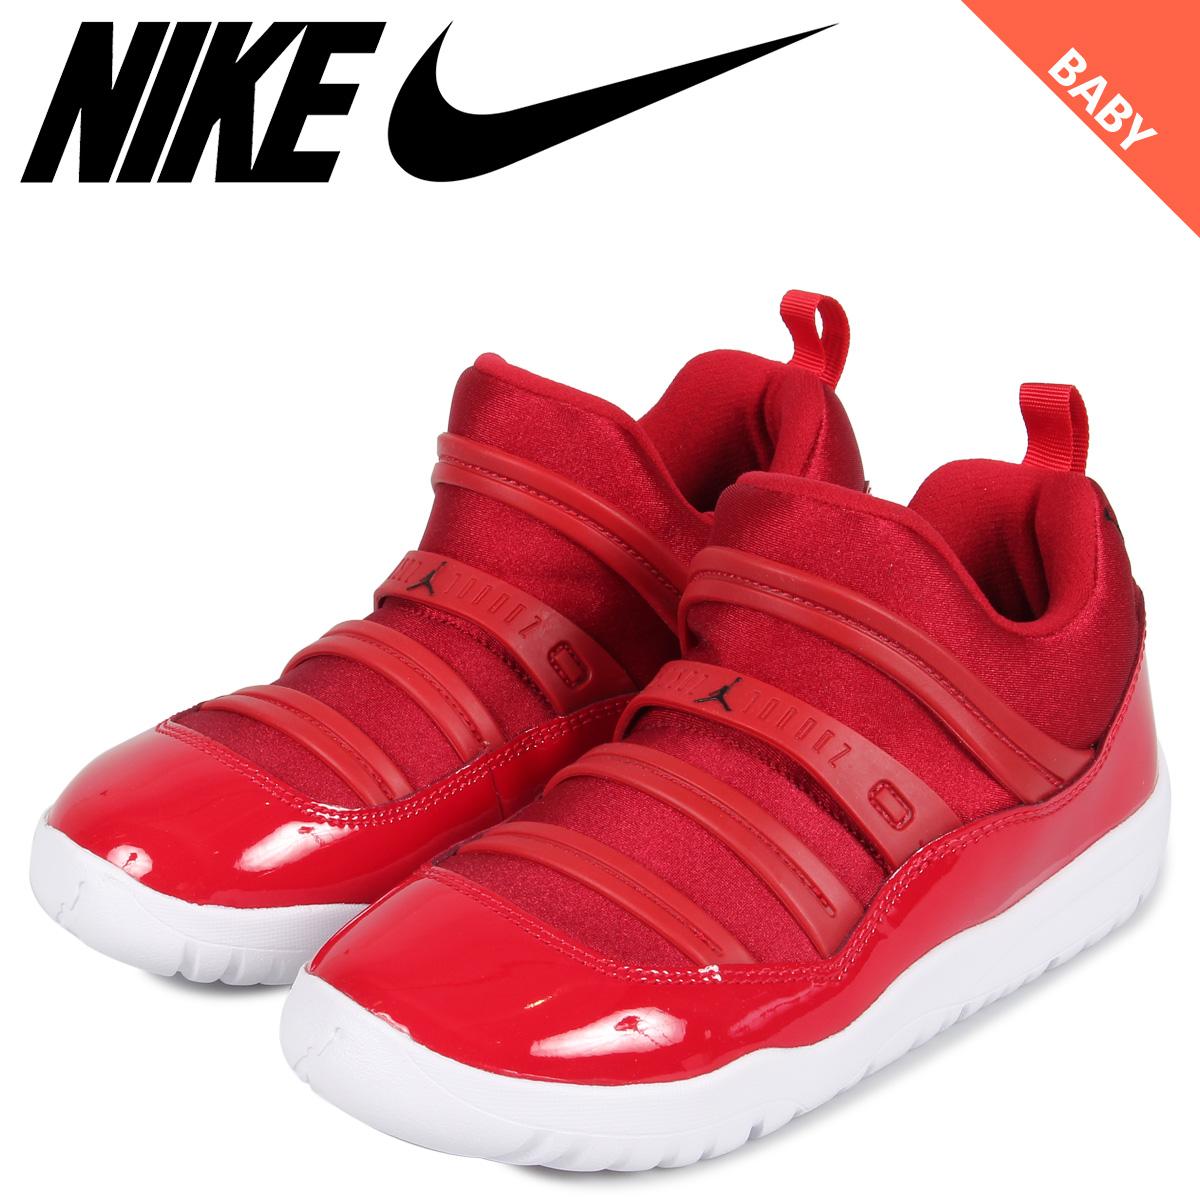 quality design 8449c 52c39 NIKE Nike Air Jordan 11 nostalgic sneakers slip-ons baby kids AIR JORDAN 11  RETRO LITTLE FLEX TD red BQ7102-623